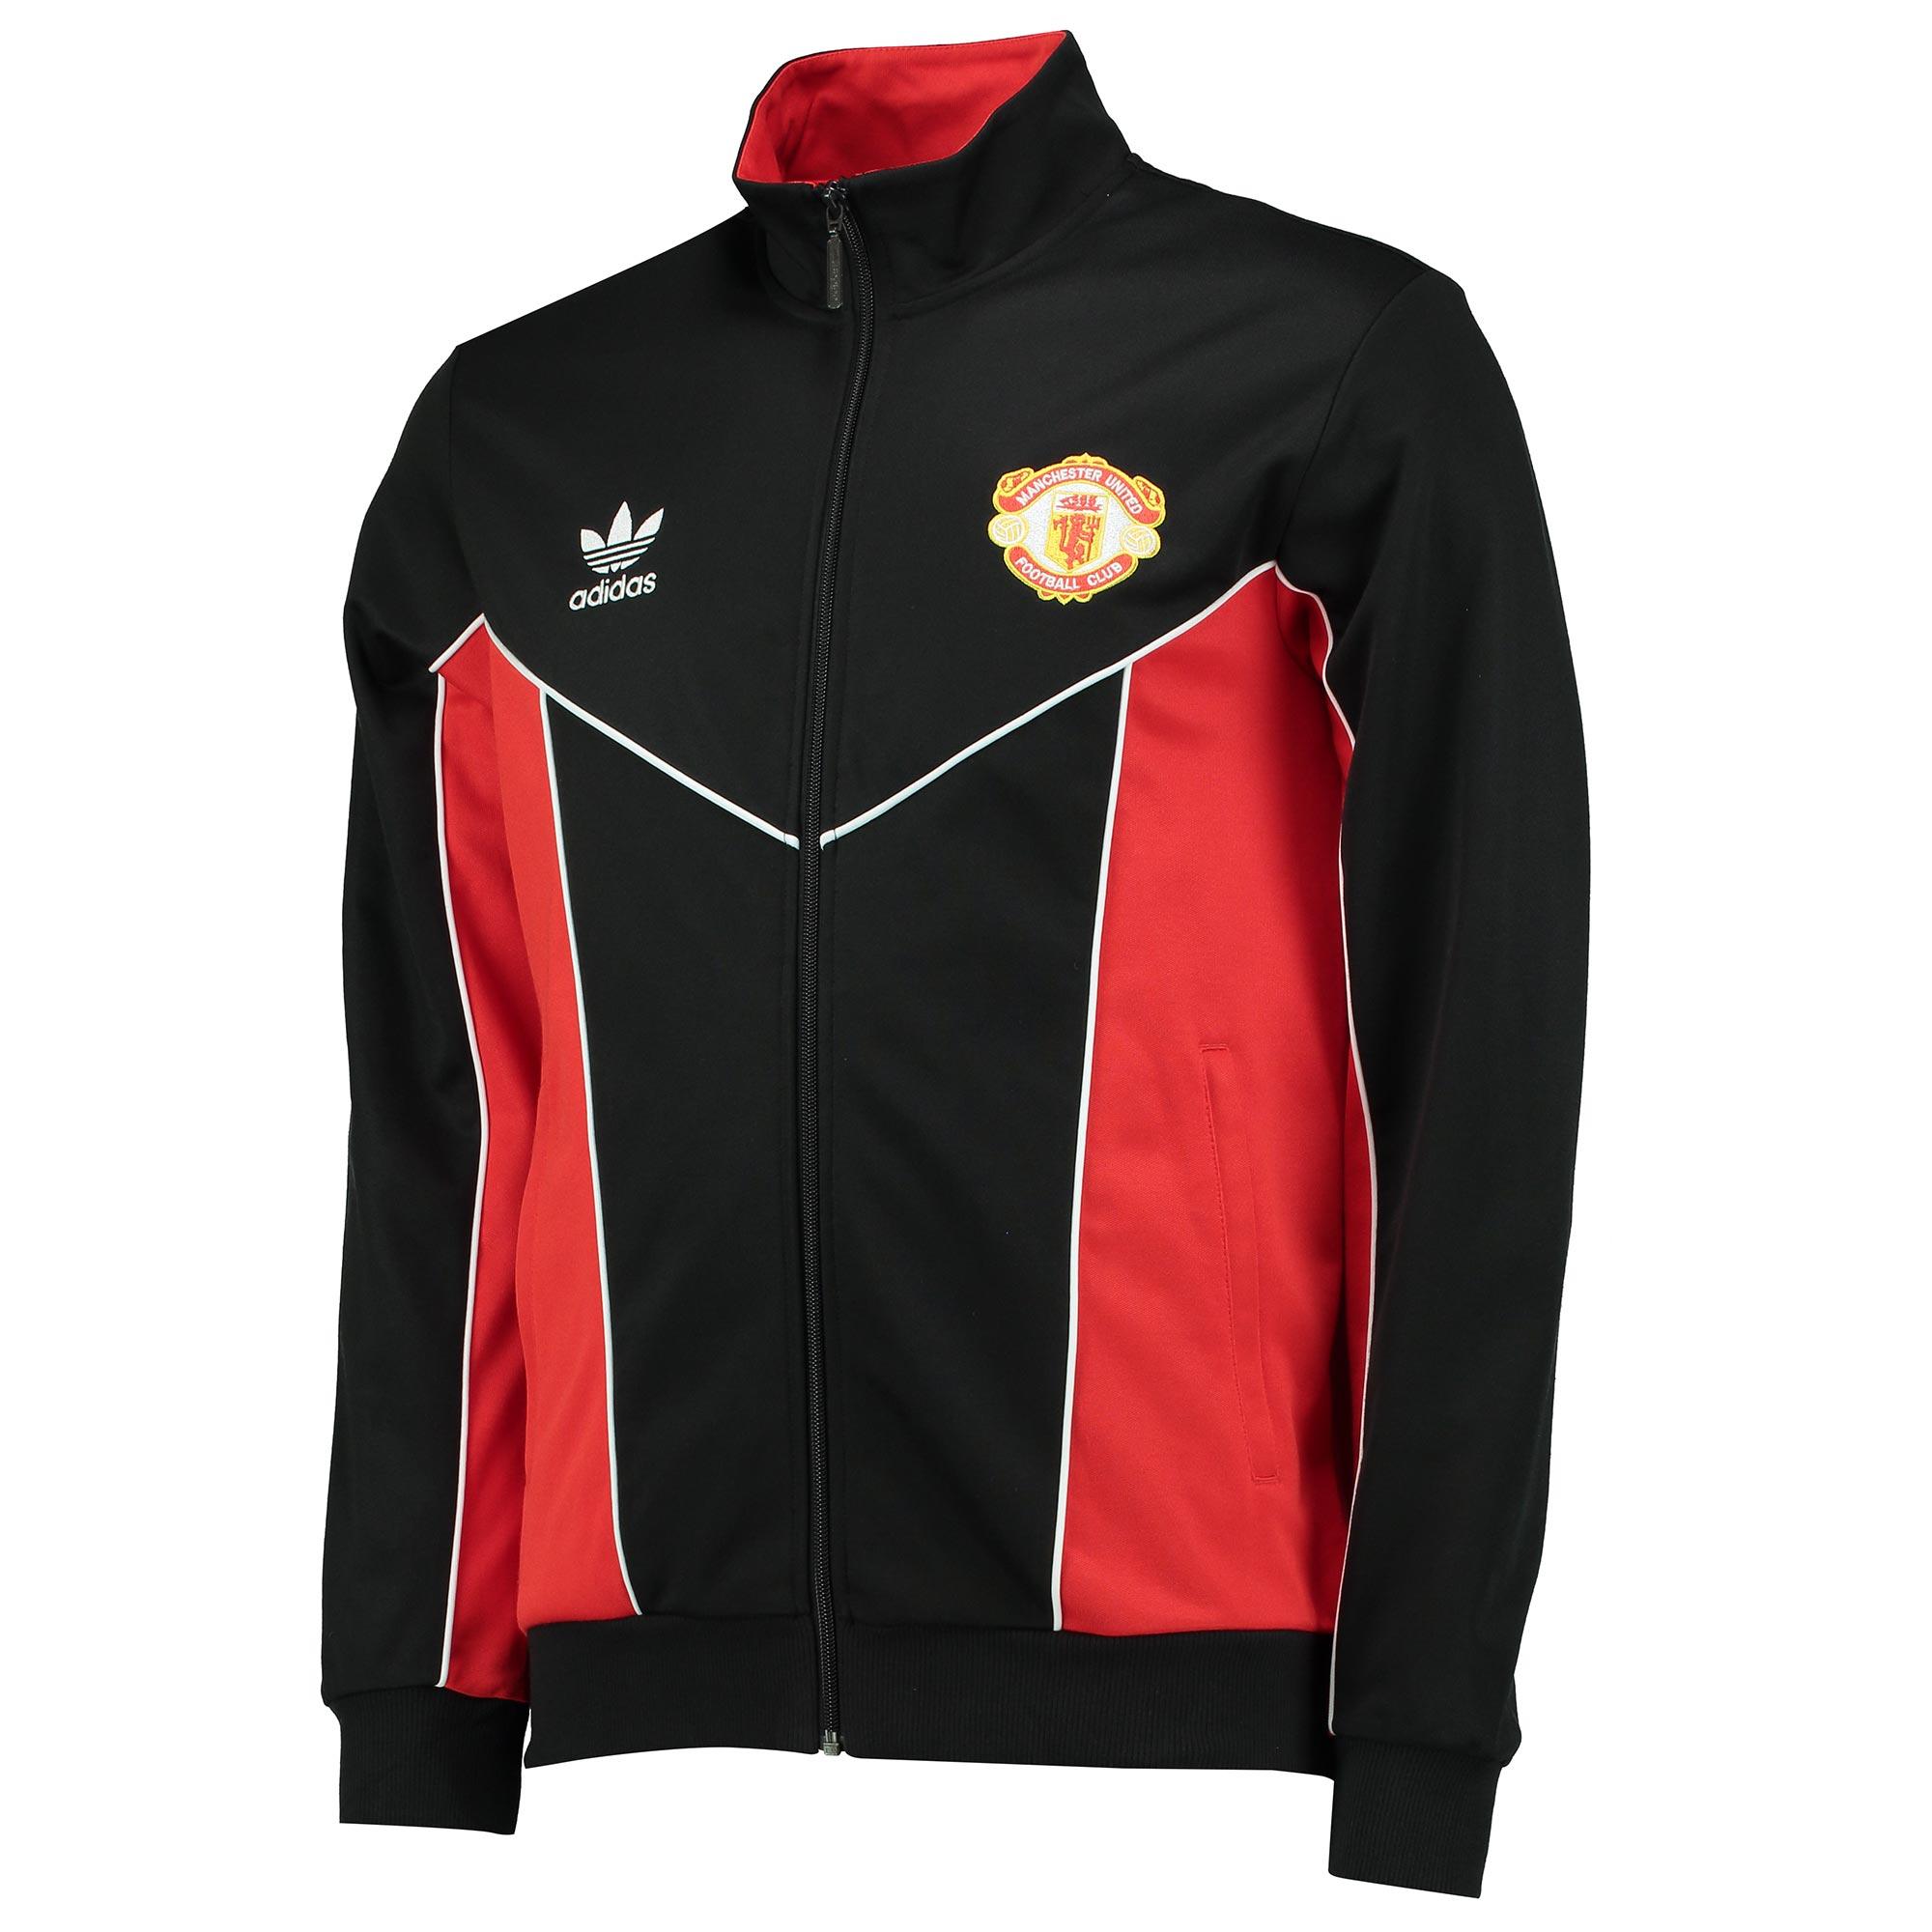 Manchester United Originals 1984 Track Top - Black-Red